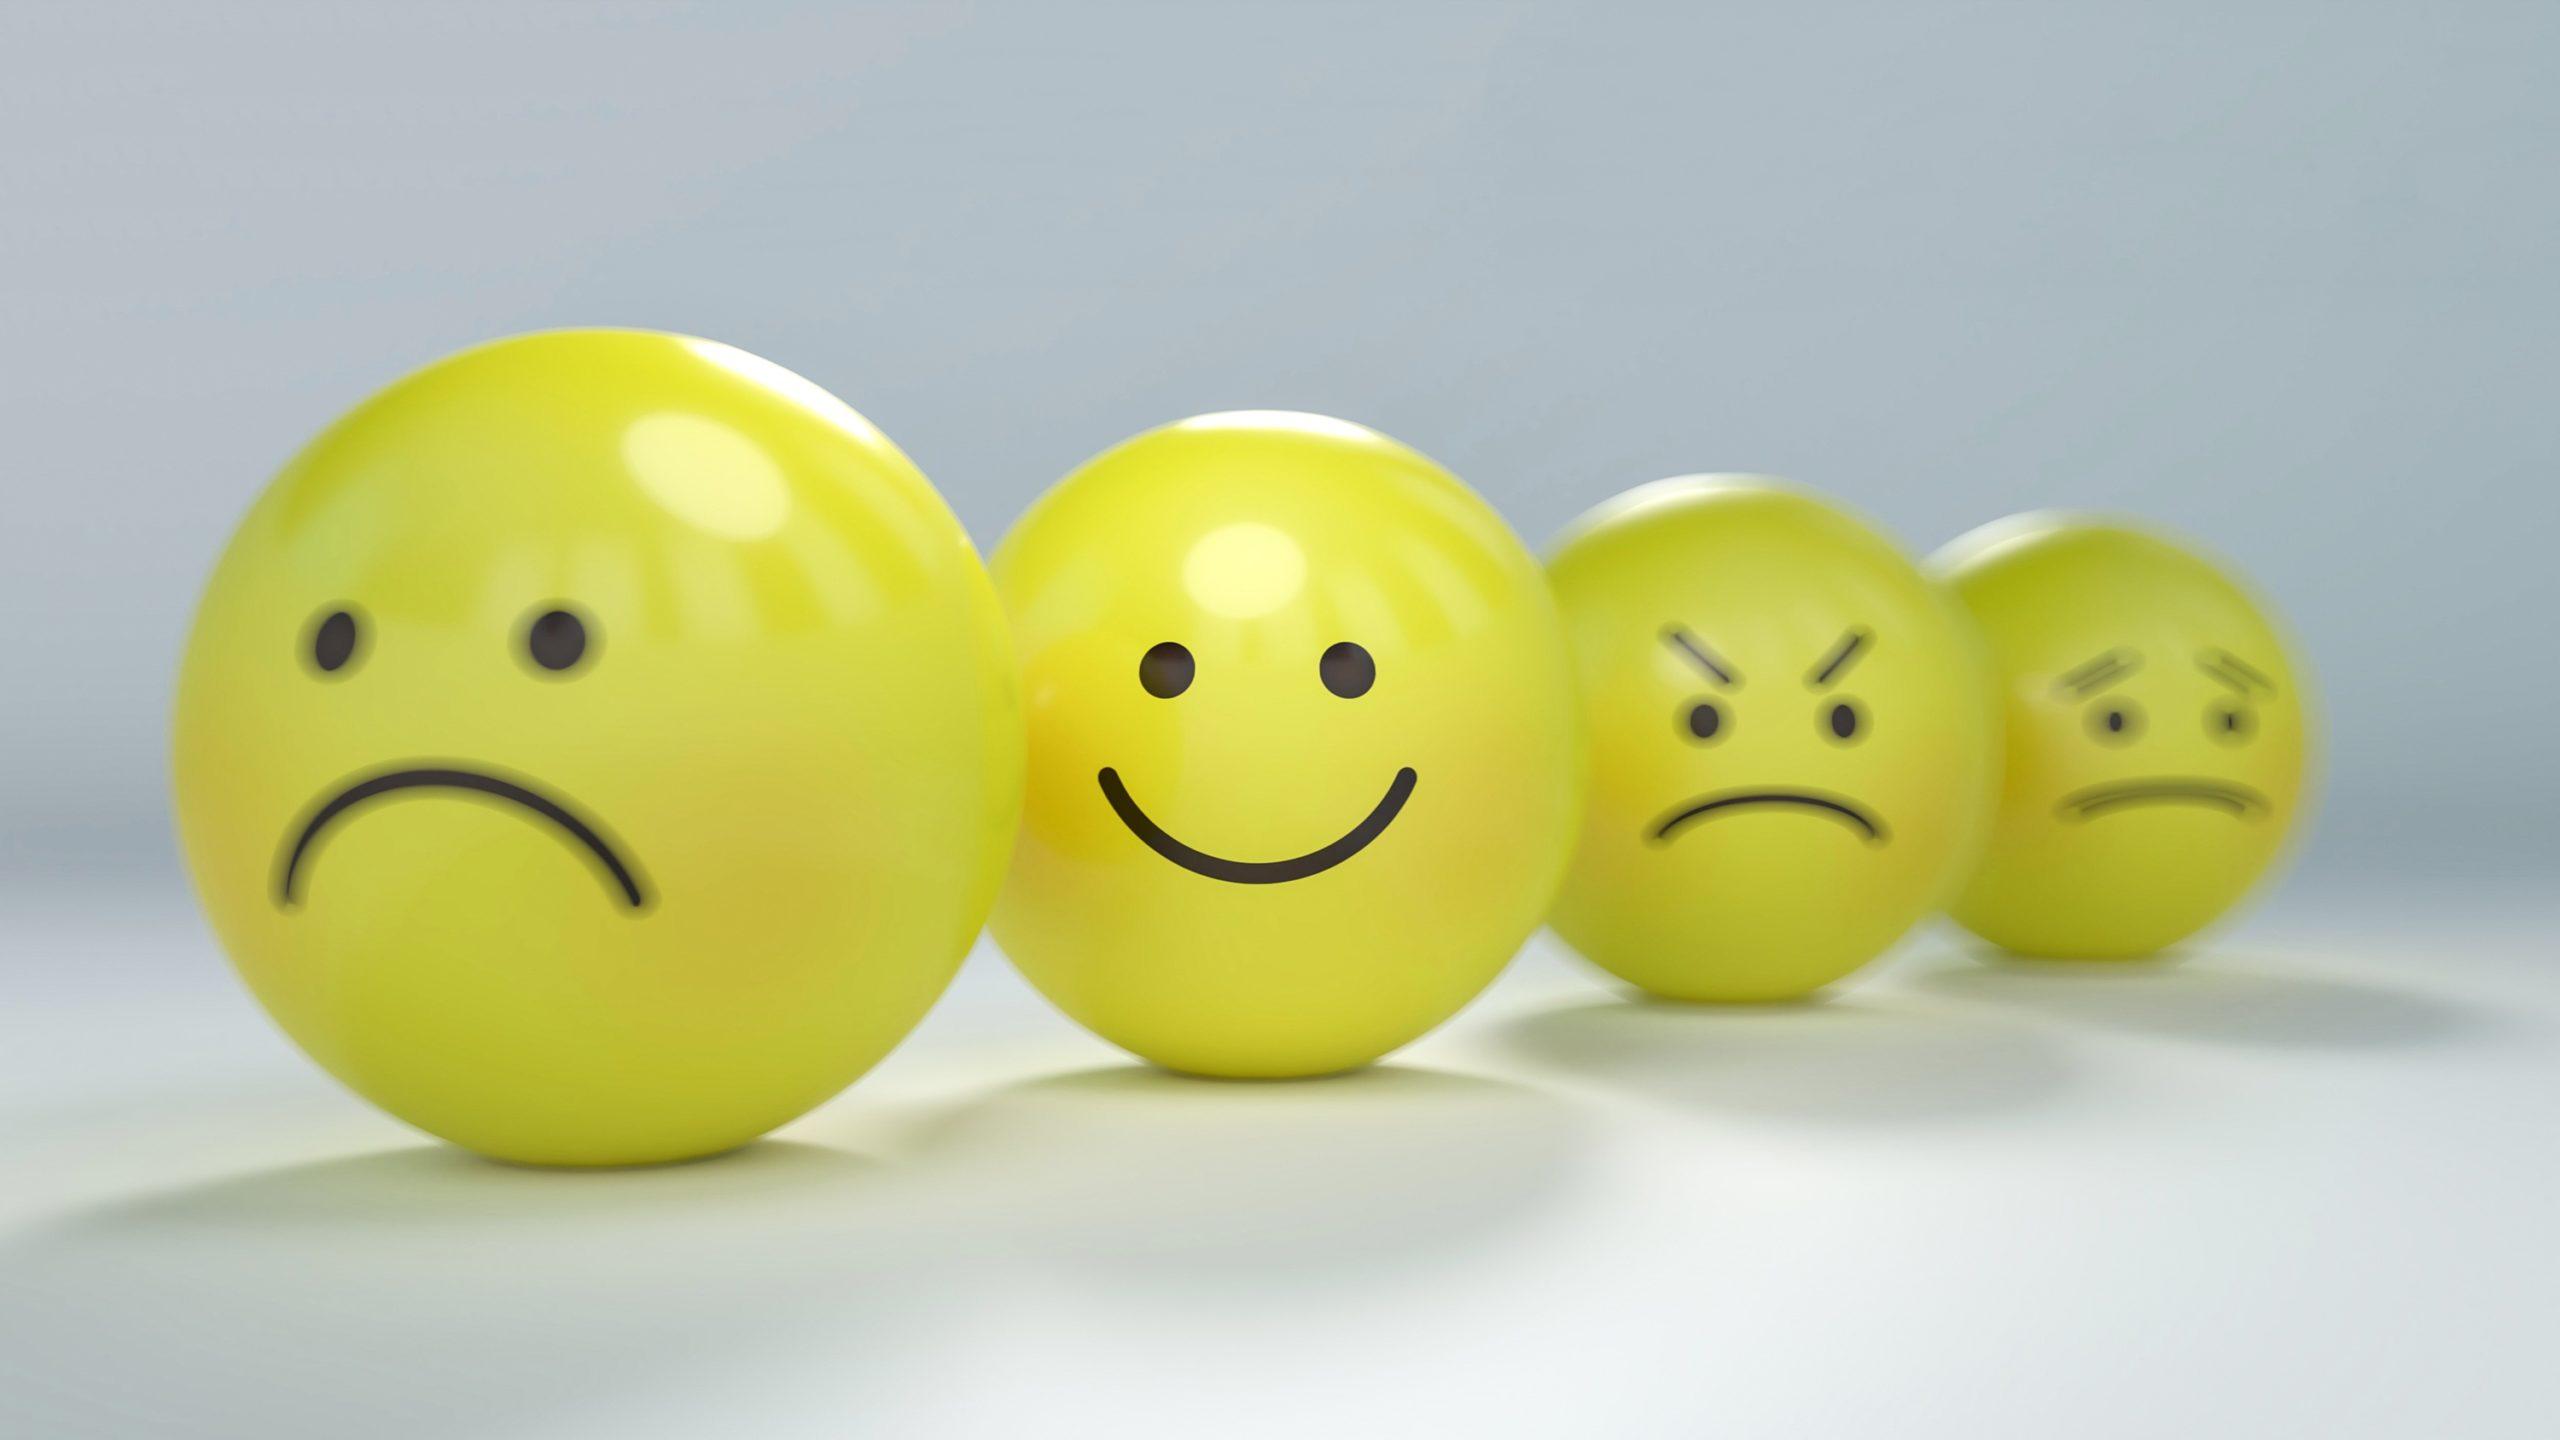 tööstress, stress, läbipõlemine